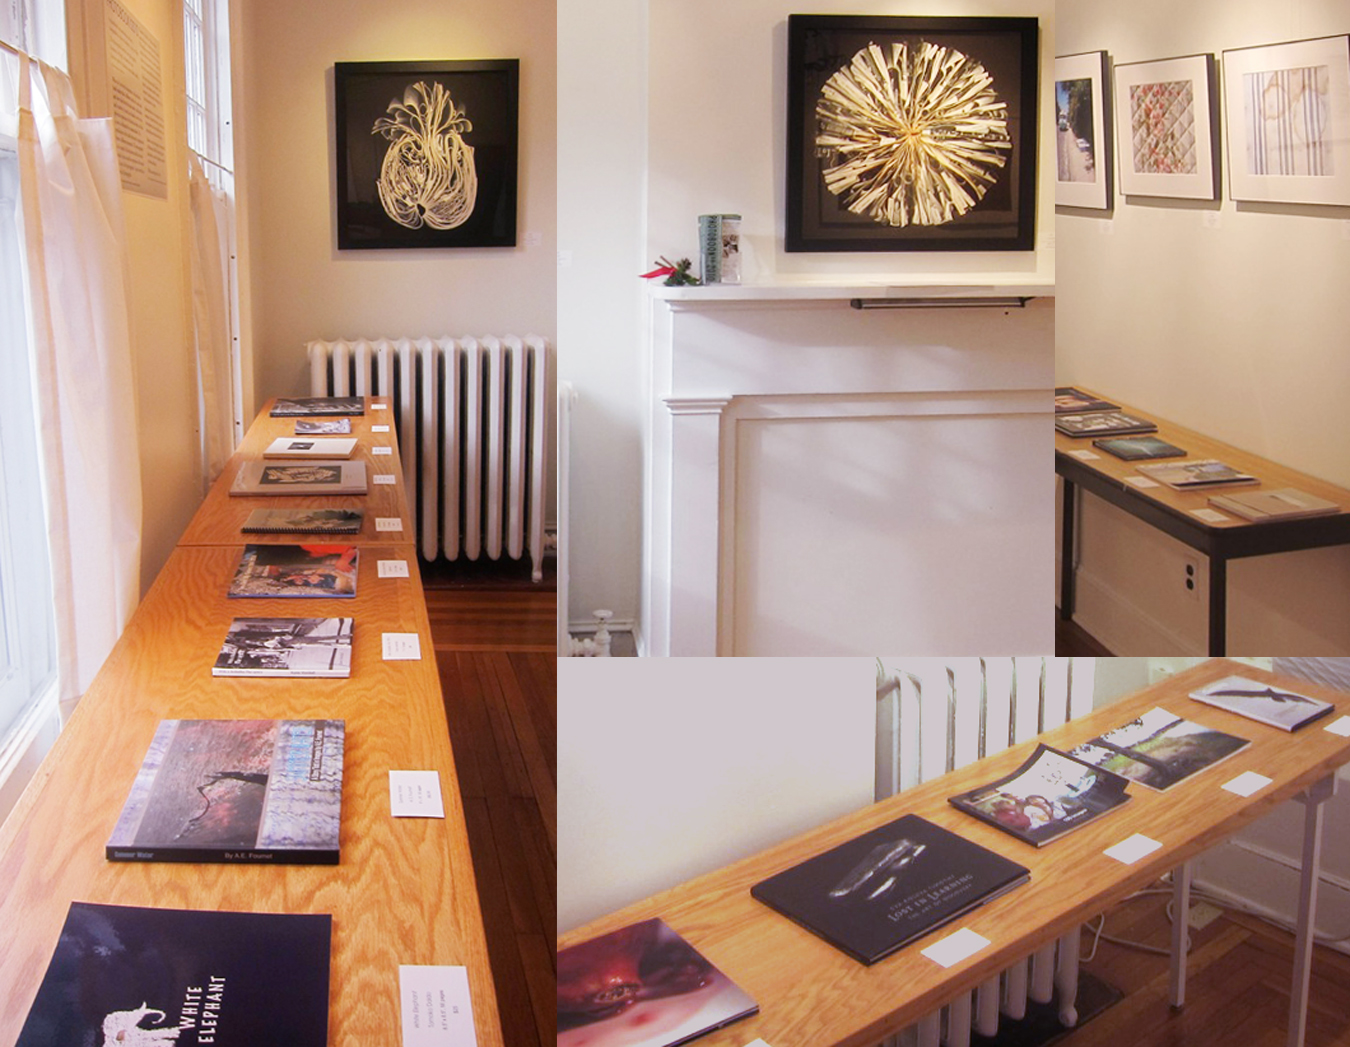 Davis Orton Gallery Photobook!! 2011 Exhibit Collage